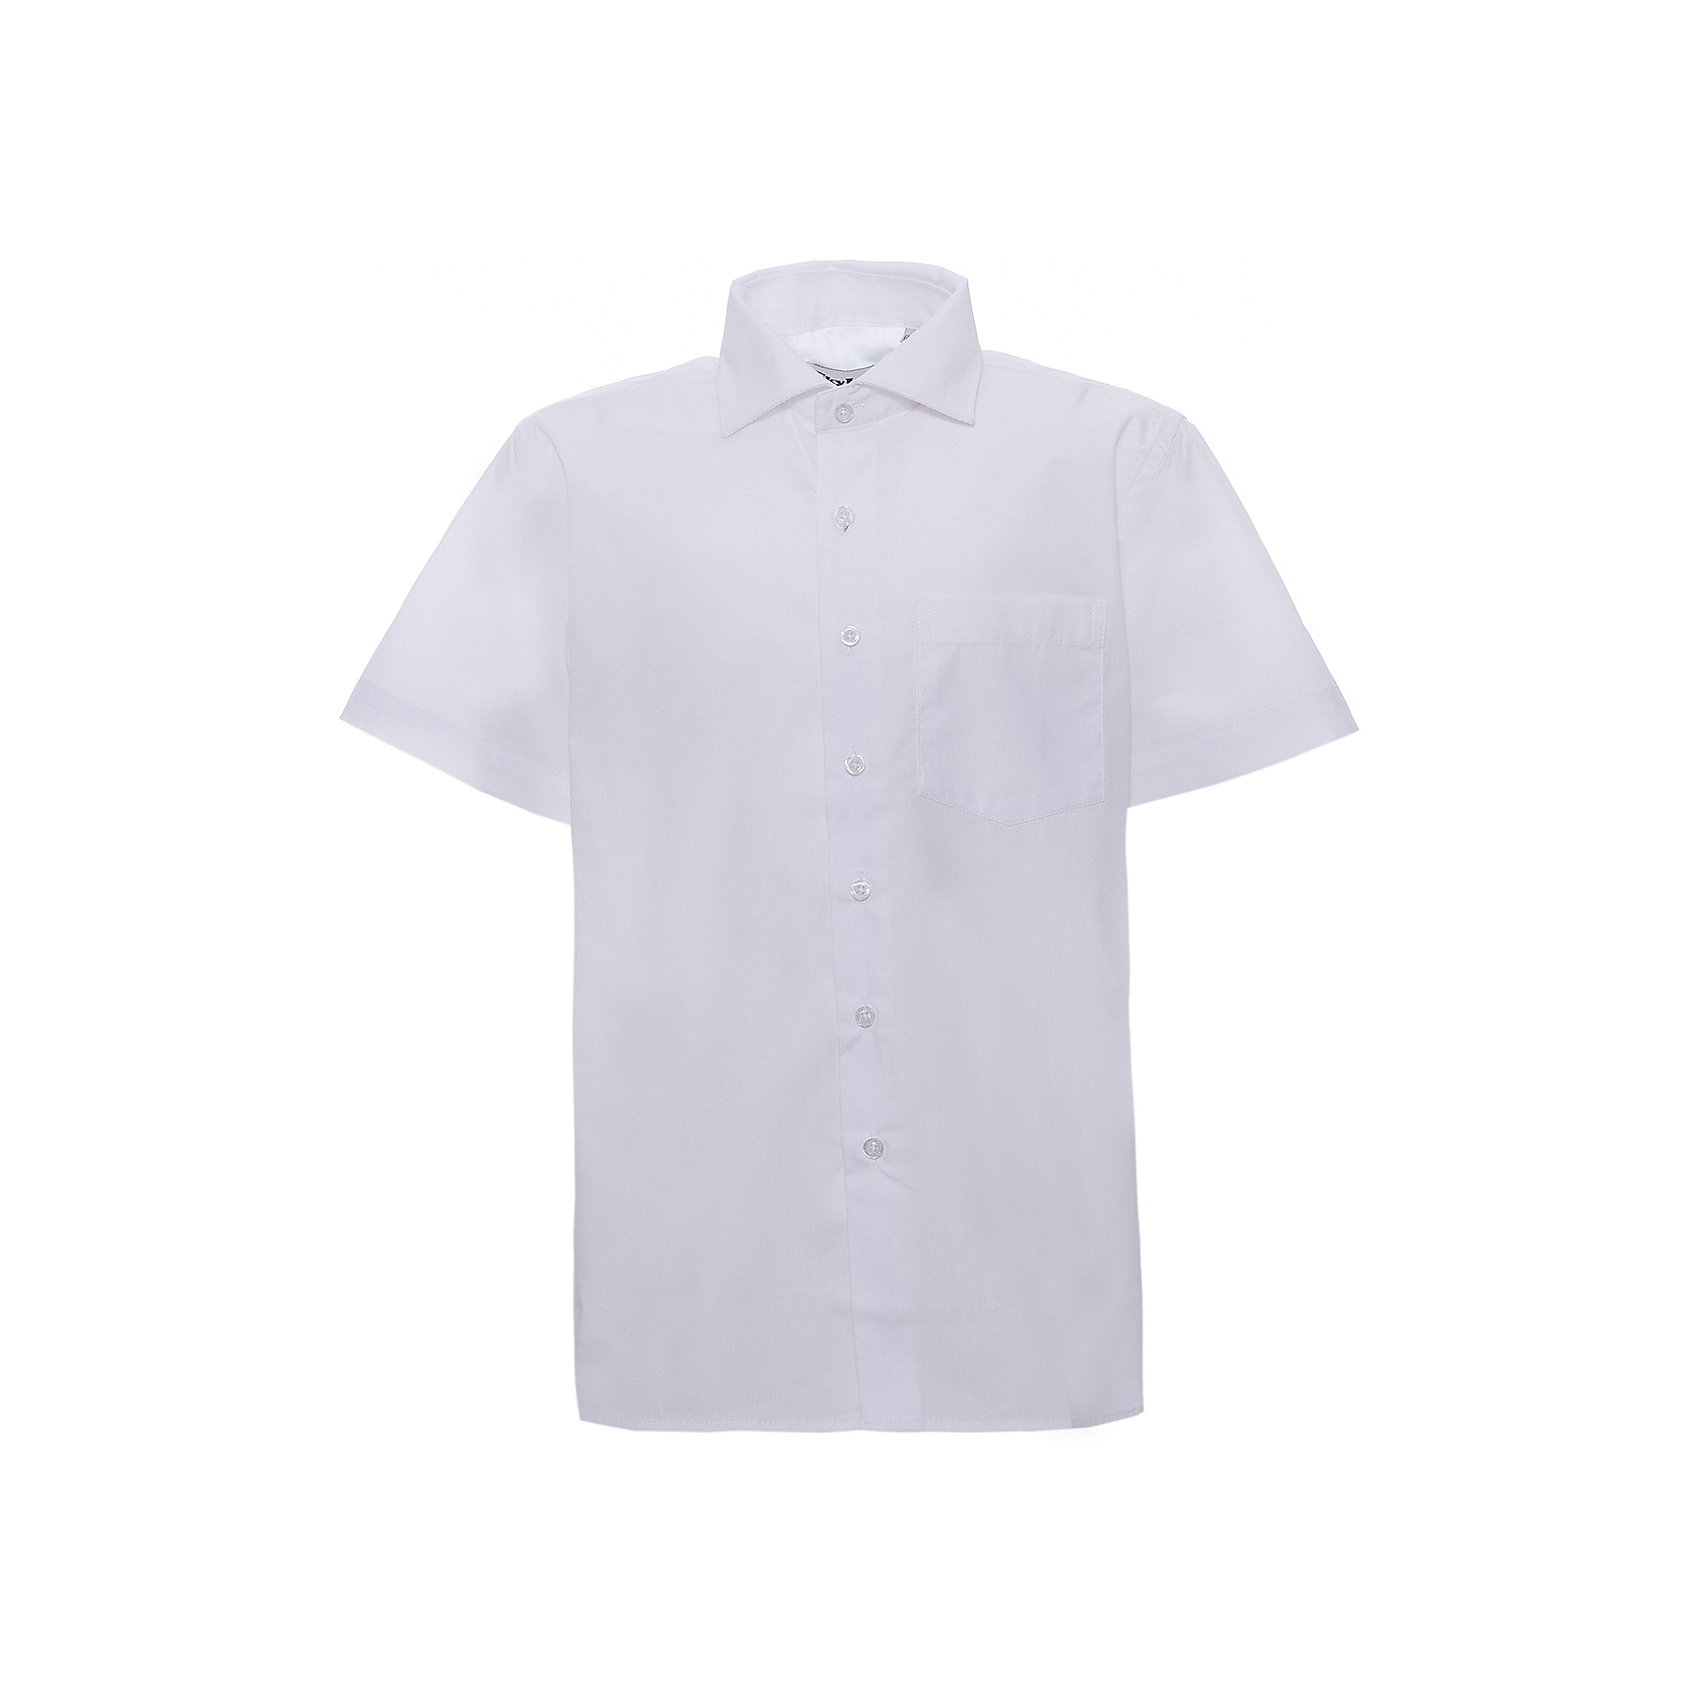 Рубашка CLASSIC SLIM FIT для мальчика SkylakeБлузки и рубашки<br>Сорочка детская для мальчика<br>Состав:<br>80% хлопок, 20% п/э<br><br>Ширина мм: 174<br>Глубина мм: 10<br>Высота мм: 169<br>Вес г: 157<br>Цвет: белый<br>Возраст от месяцев: 144<br>Возраст до месяцев: 156<br>Пол: Мужской<br>Возраст: Детский<br>Размер: 158,122,128,134,140,146,152<br>SKU: 6772785